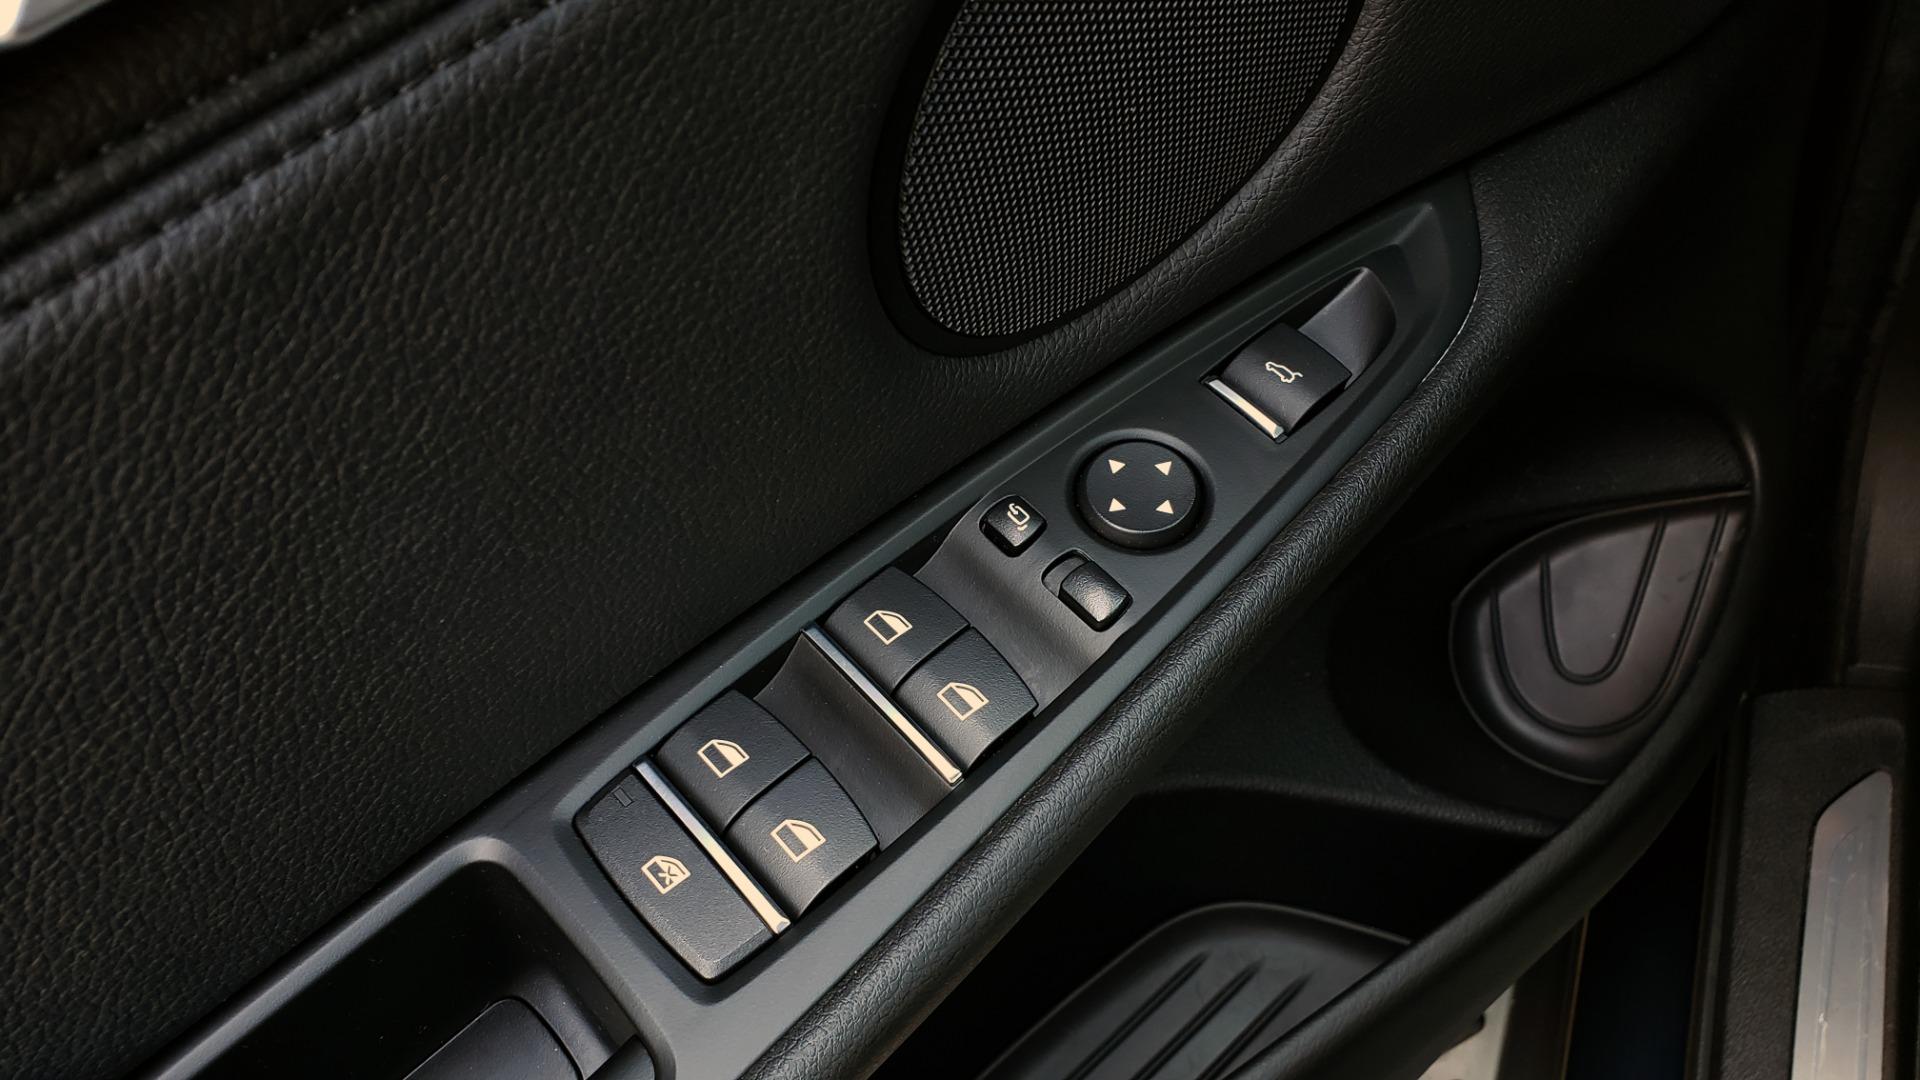 Used 2016 BMW X5 XDRIVE35I / PREM PKG / NAV / DRVR ASST PLUS / REARVIEW for sale $25,765 at Formula Imports in Charlotte NC 28227 26